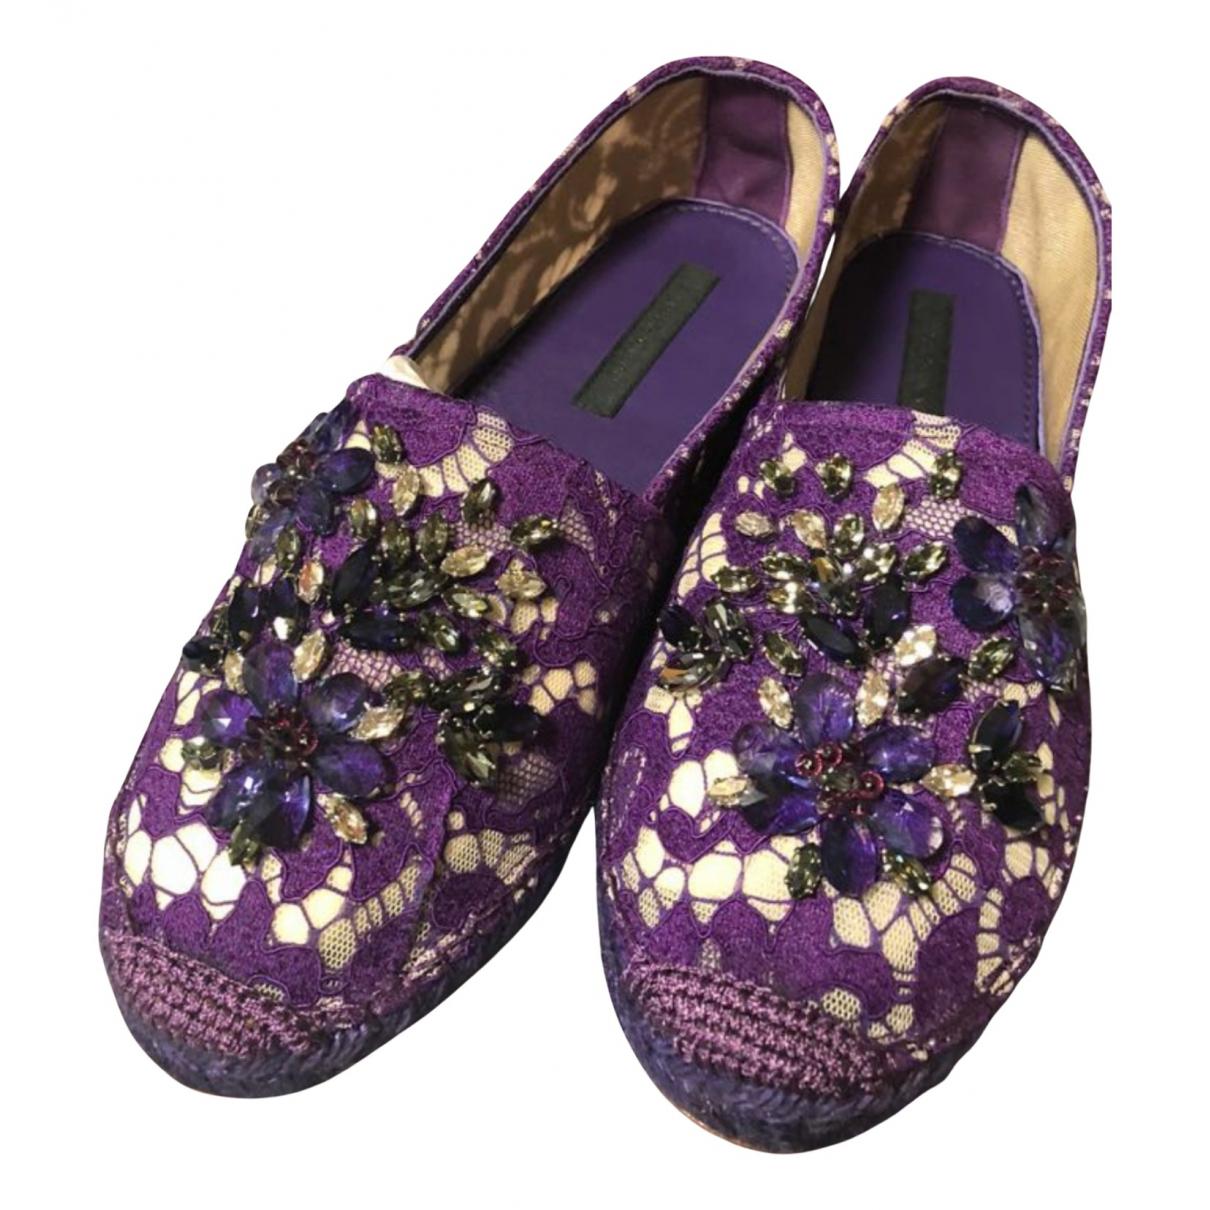 Dolce & Gabbana N Purple Cloth Espadrilles for Women 38 EU